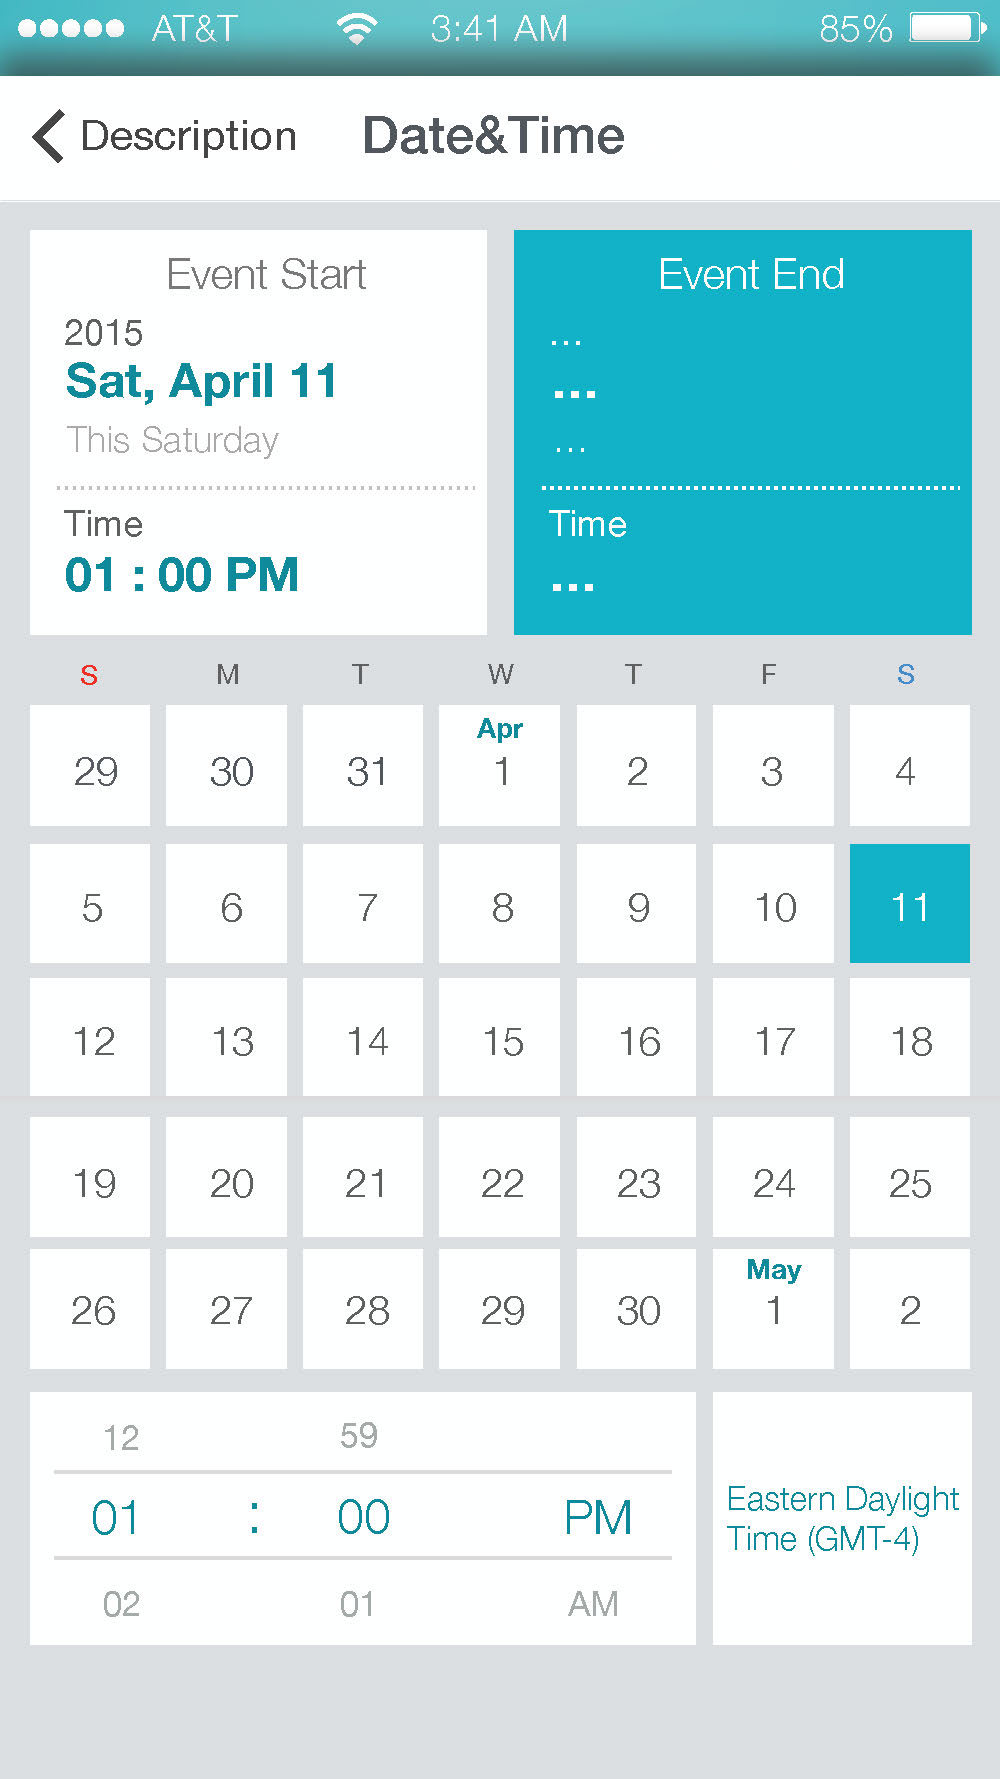 Invite_iphone6_9_Page_68.jpg